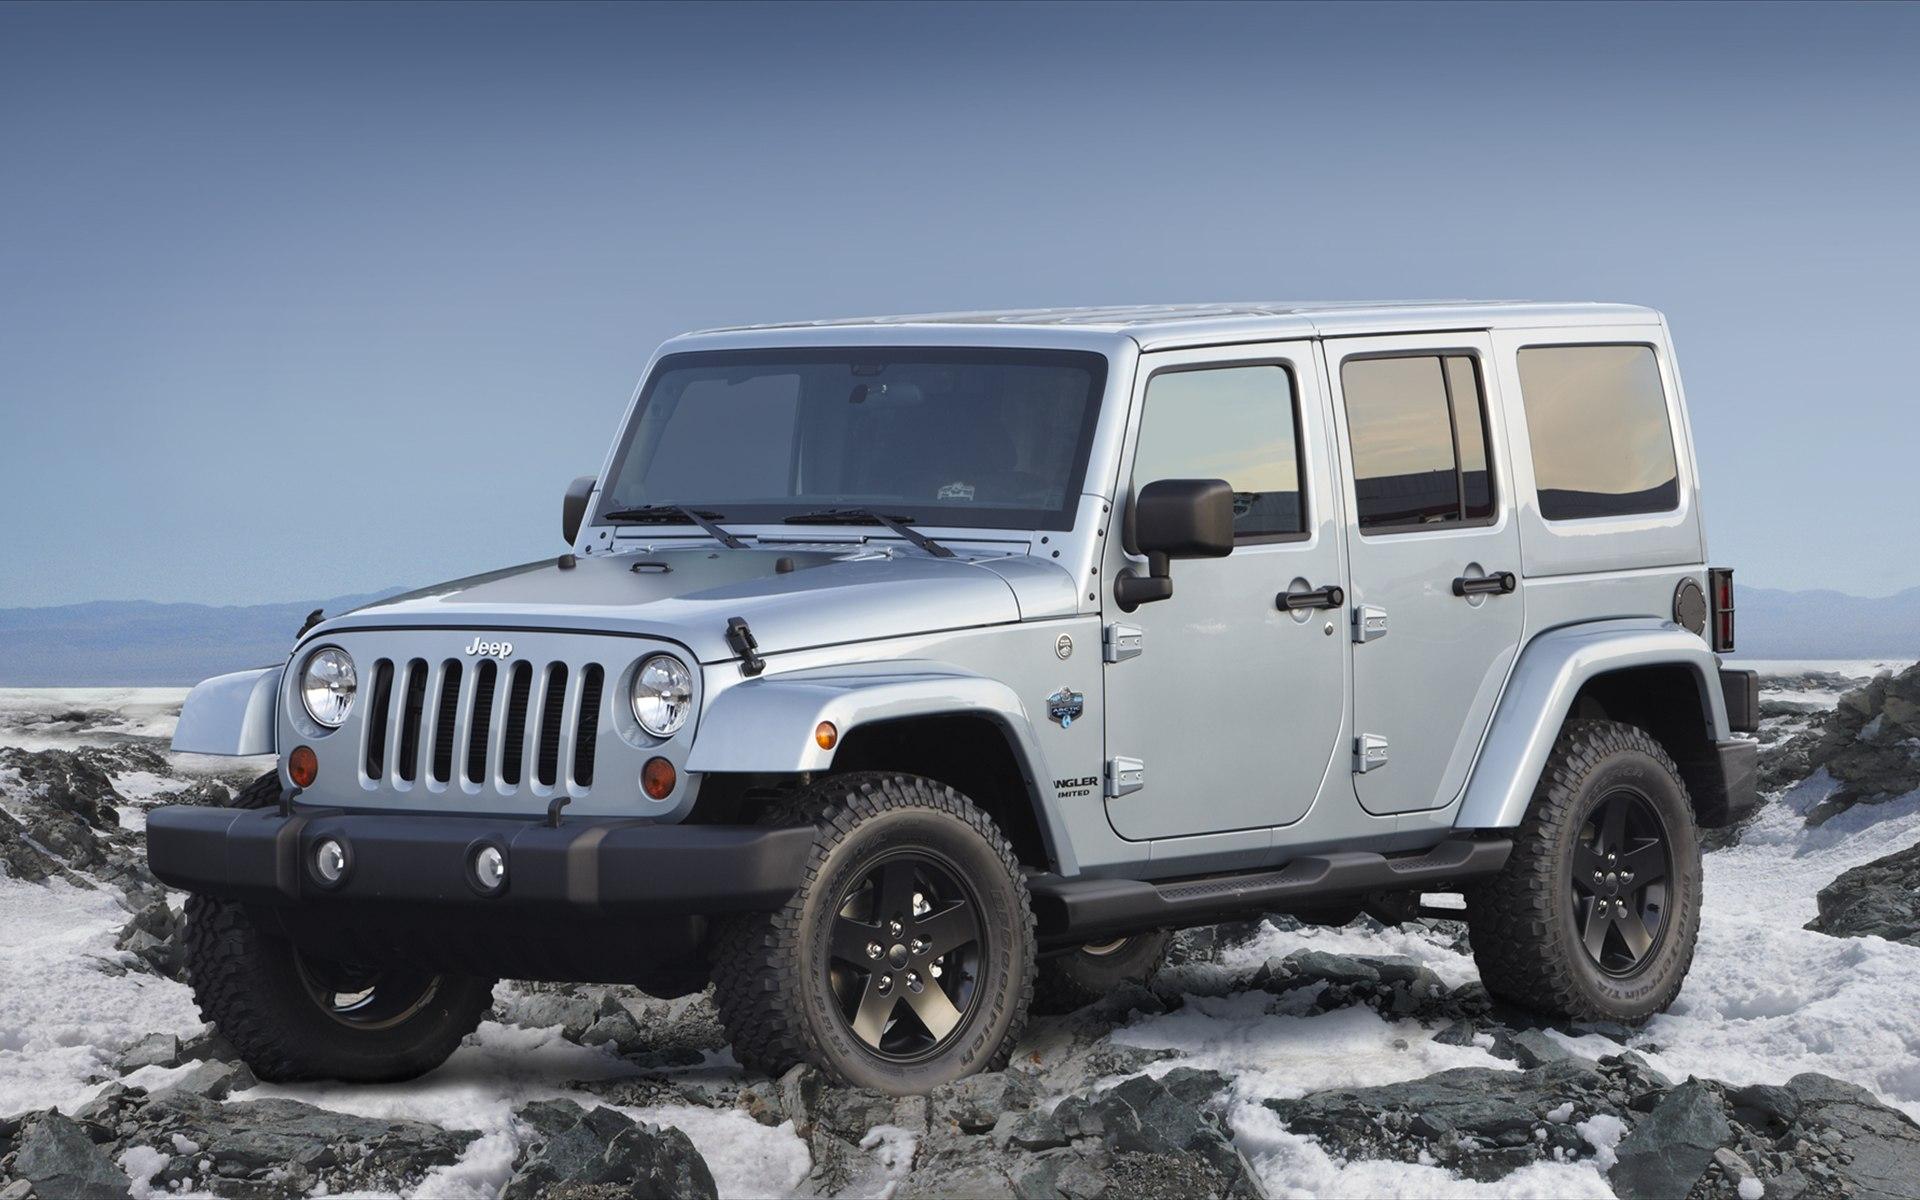 2012 Jeep Wrangler Unlimited Arctic Wallpaper HD Car Wallpapers 1920x1200